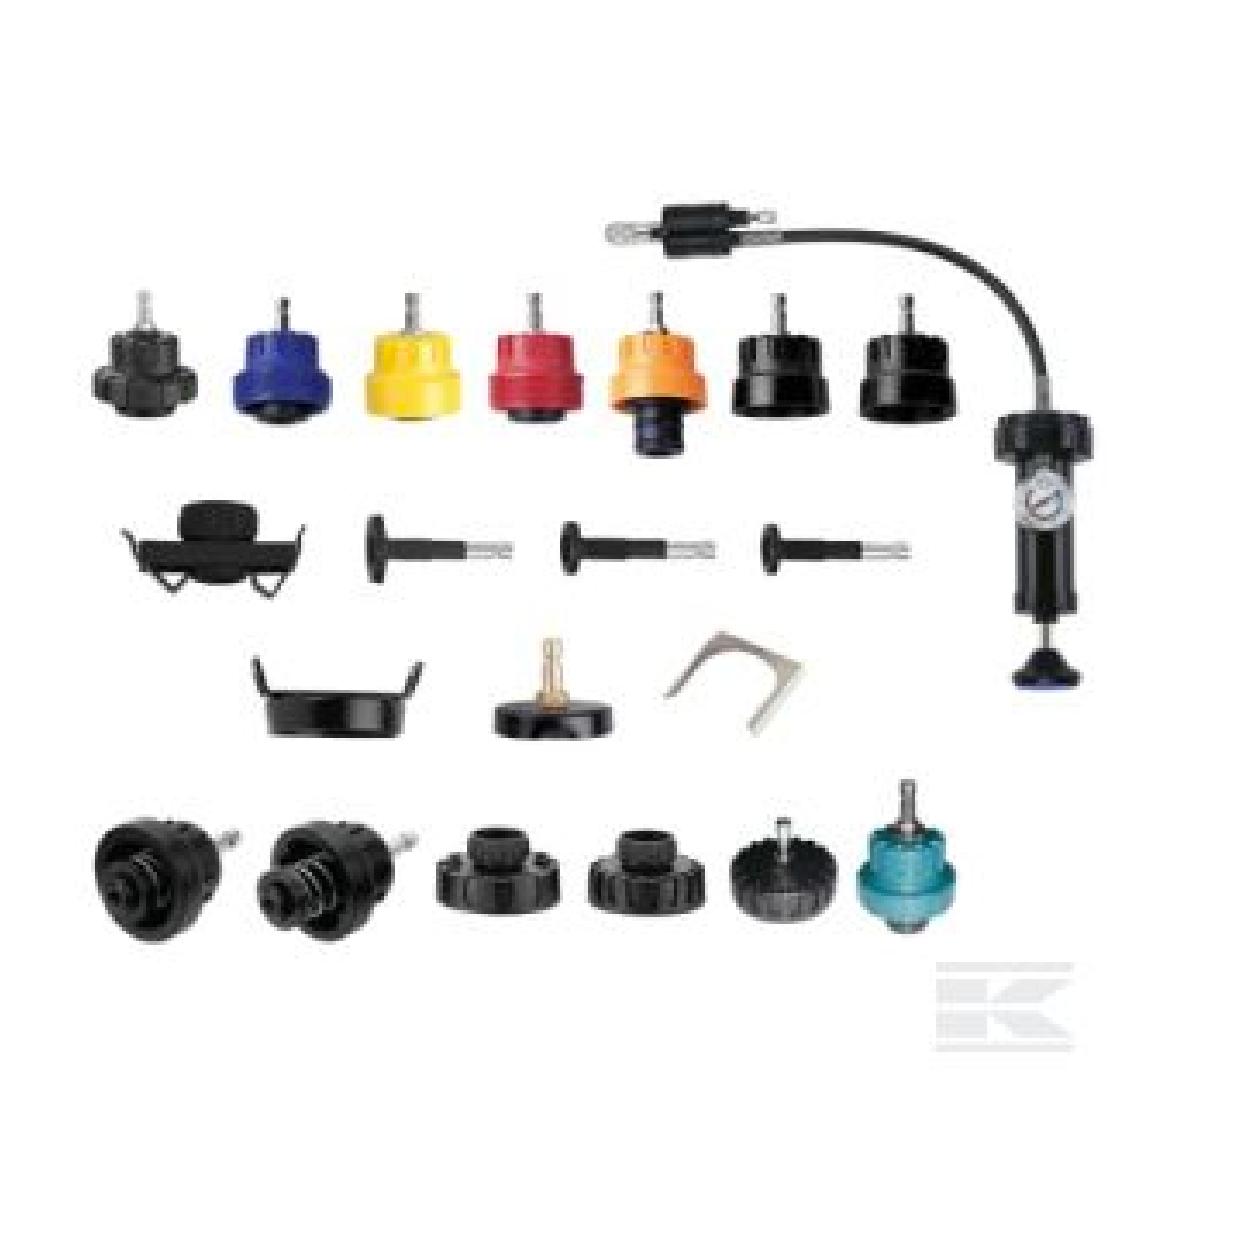 - Radiator pressure tester kit